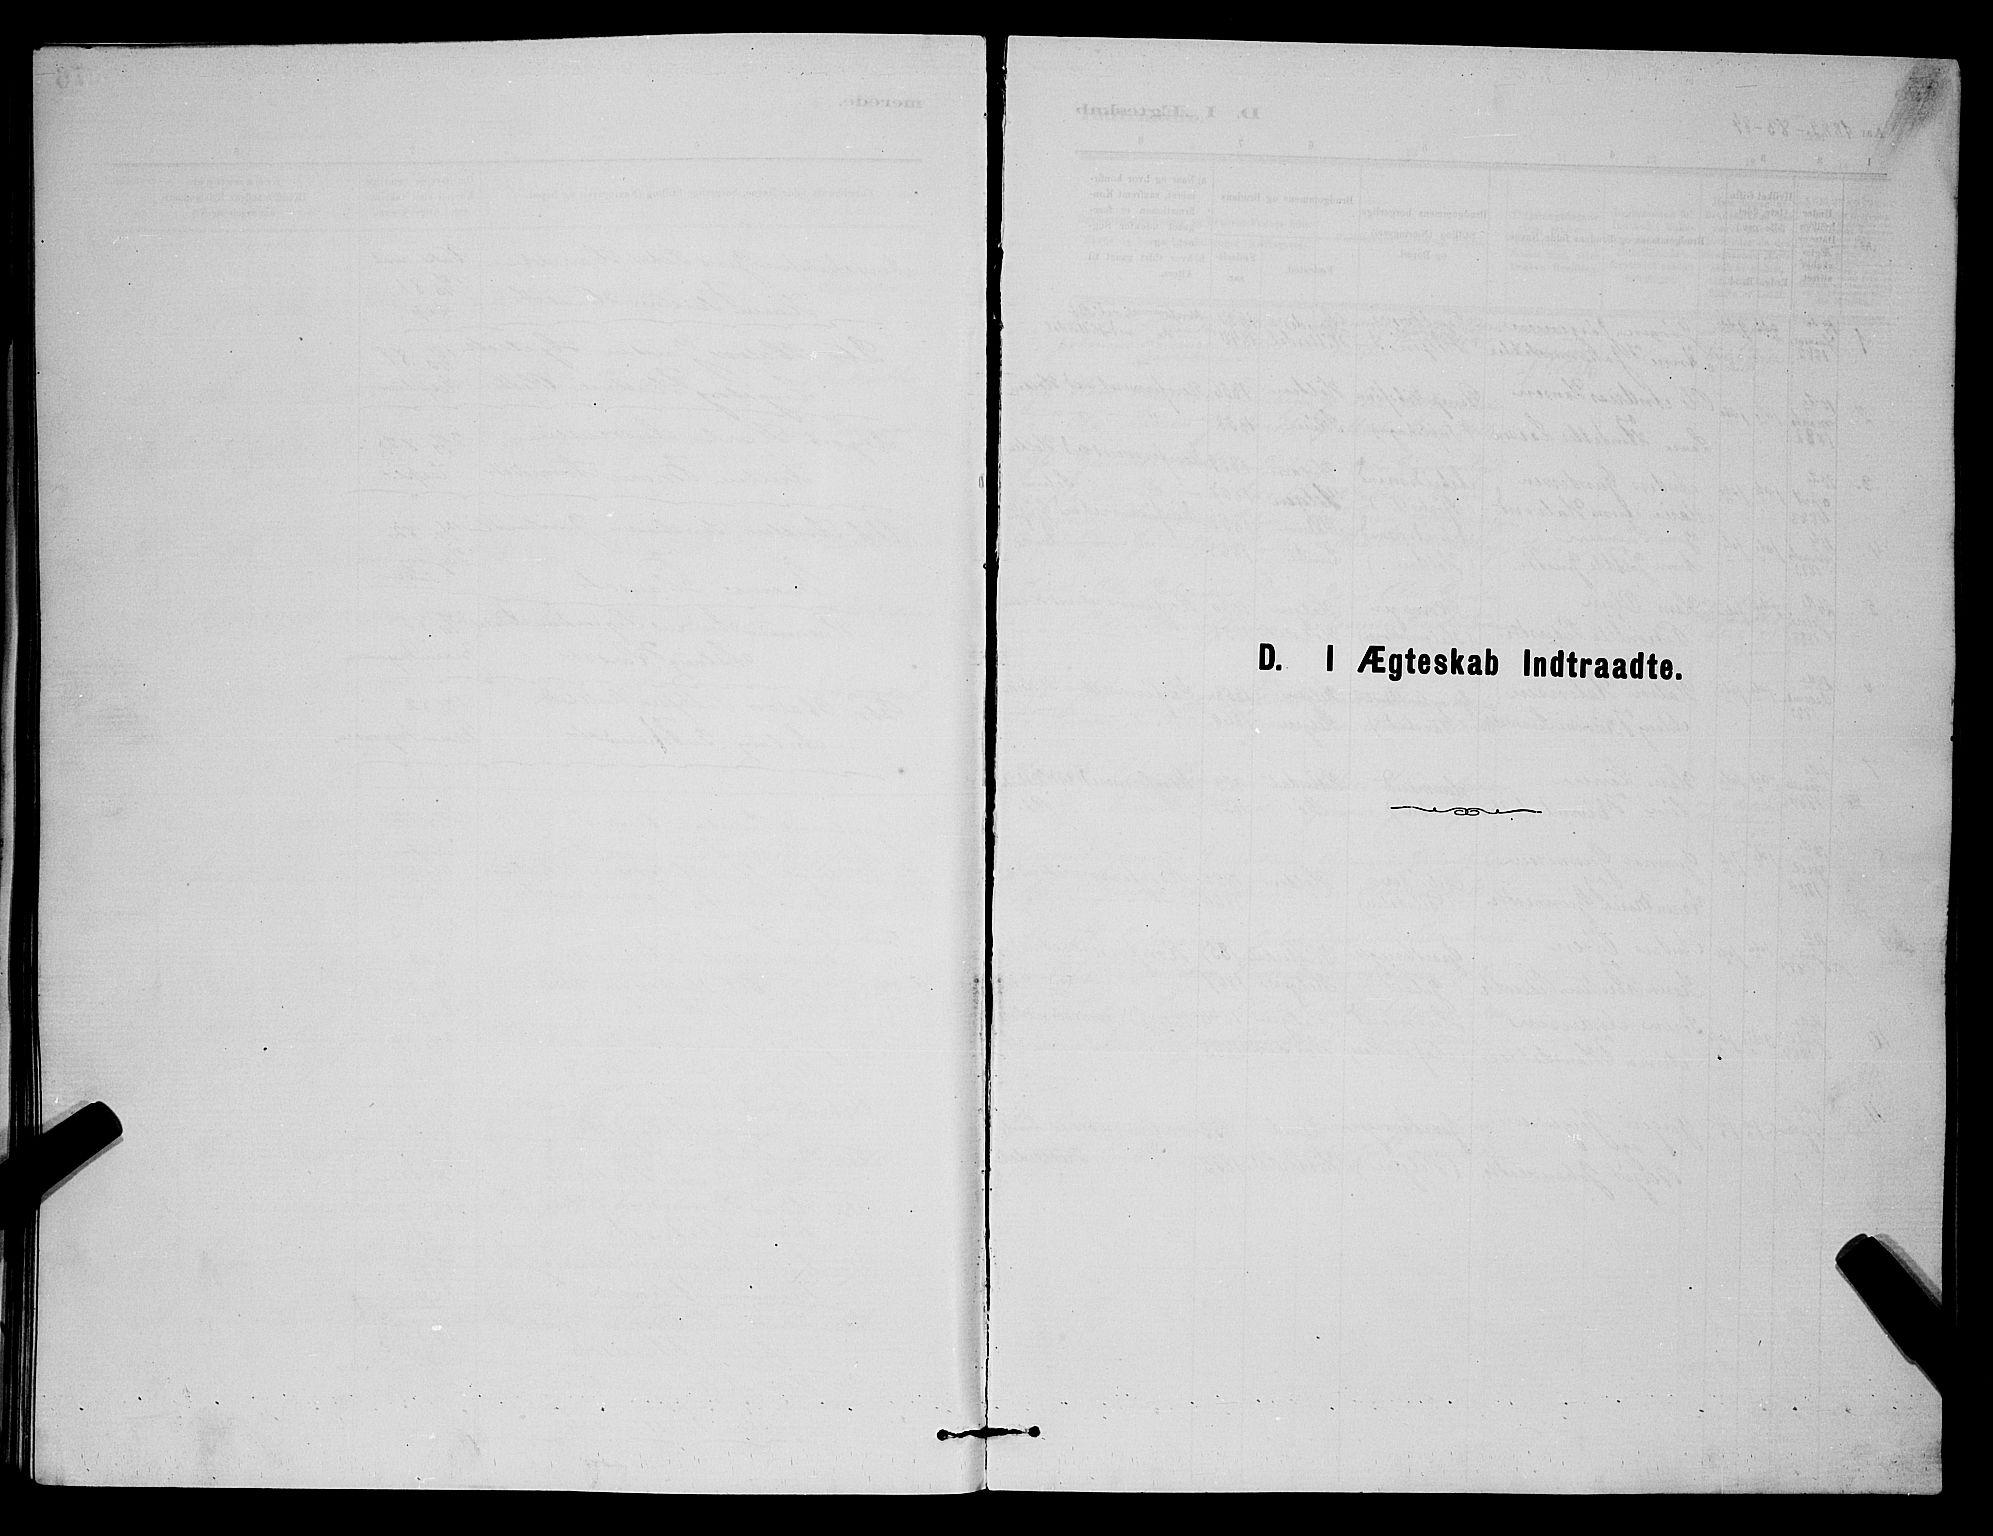 SAKO, Holla kirkebøker, G/Gb/L0001: Klokkerbok nr. II 1, 1882-1897